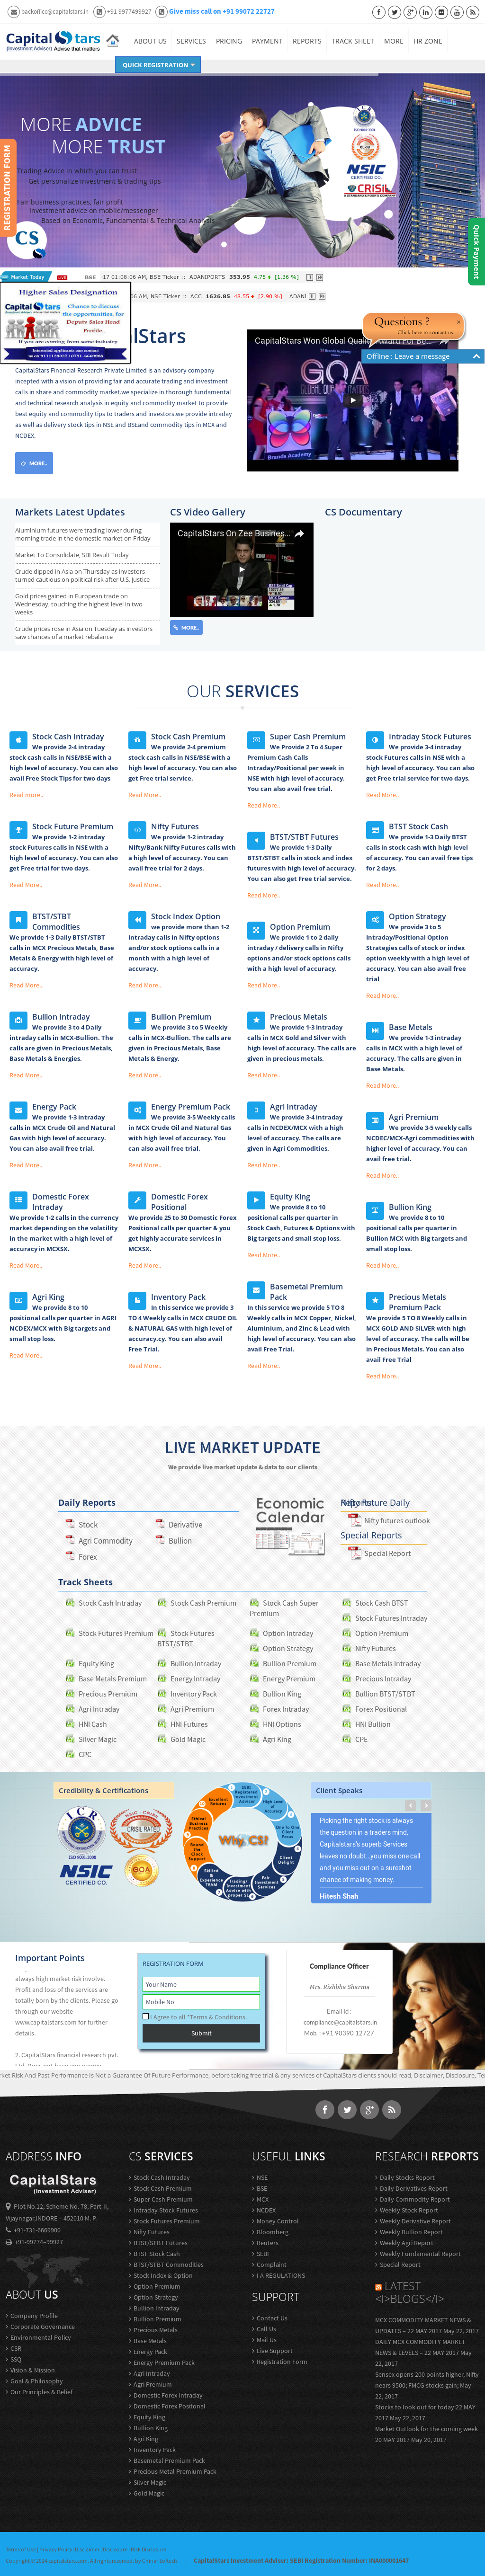 CapitalStars Financial Research Competitors, Revenue and